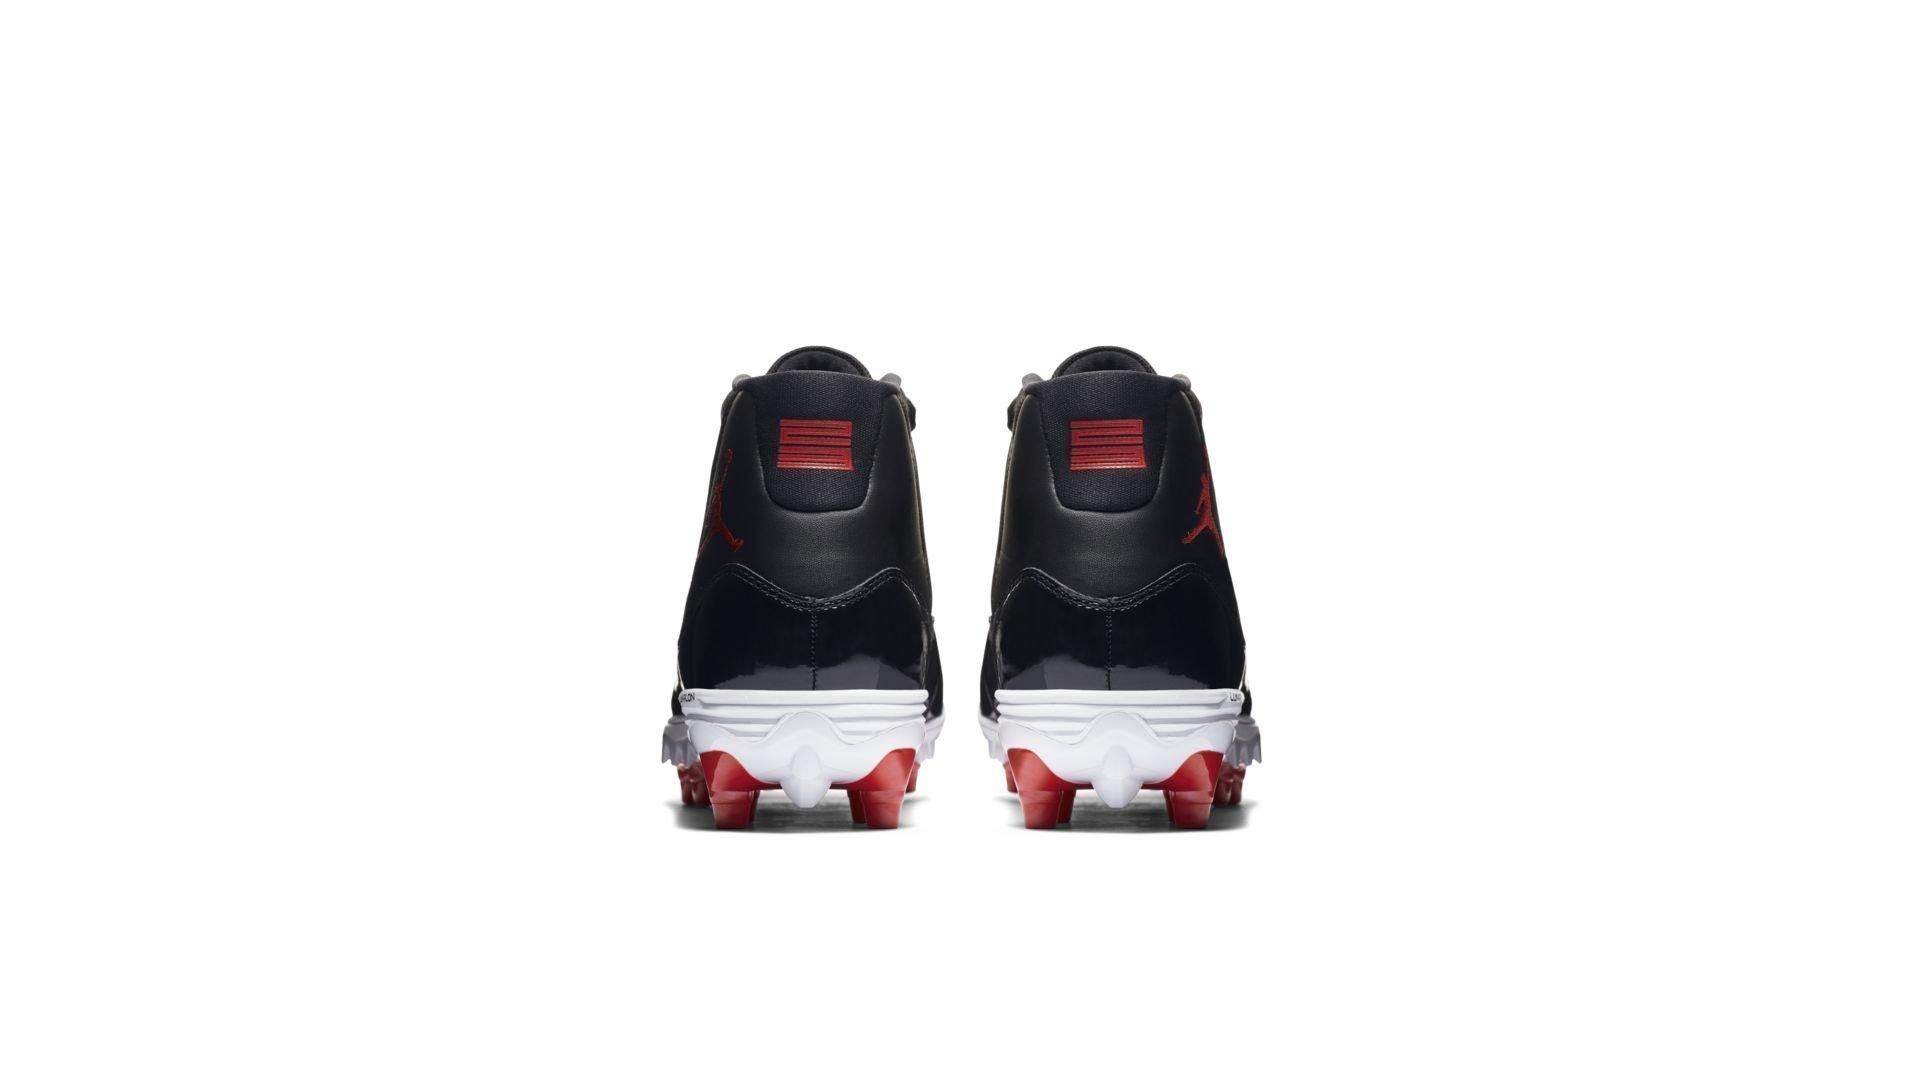 Jordan 11 Retro Cleat Bred (AO1561-010)